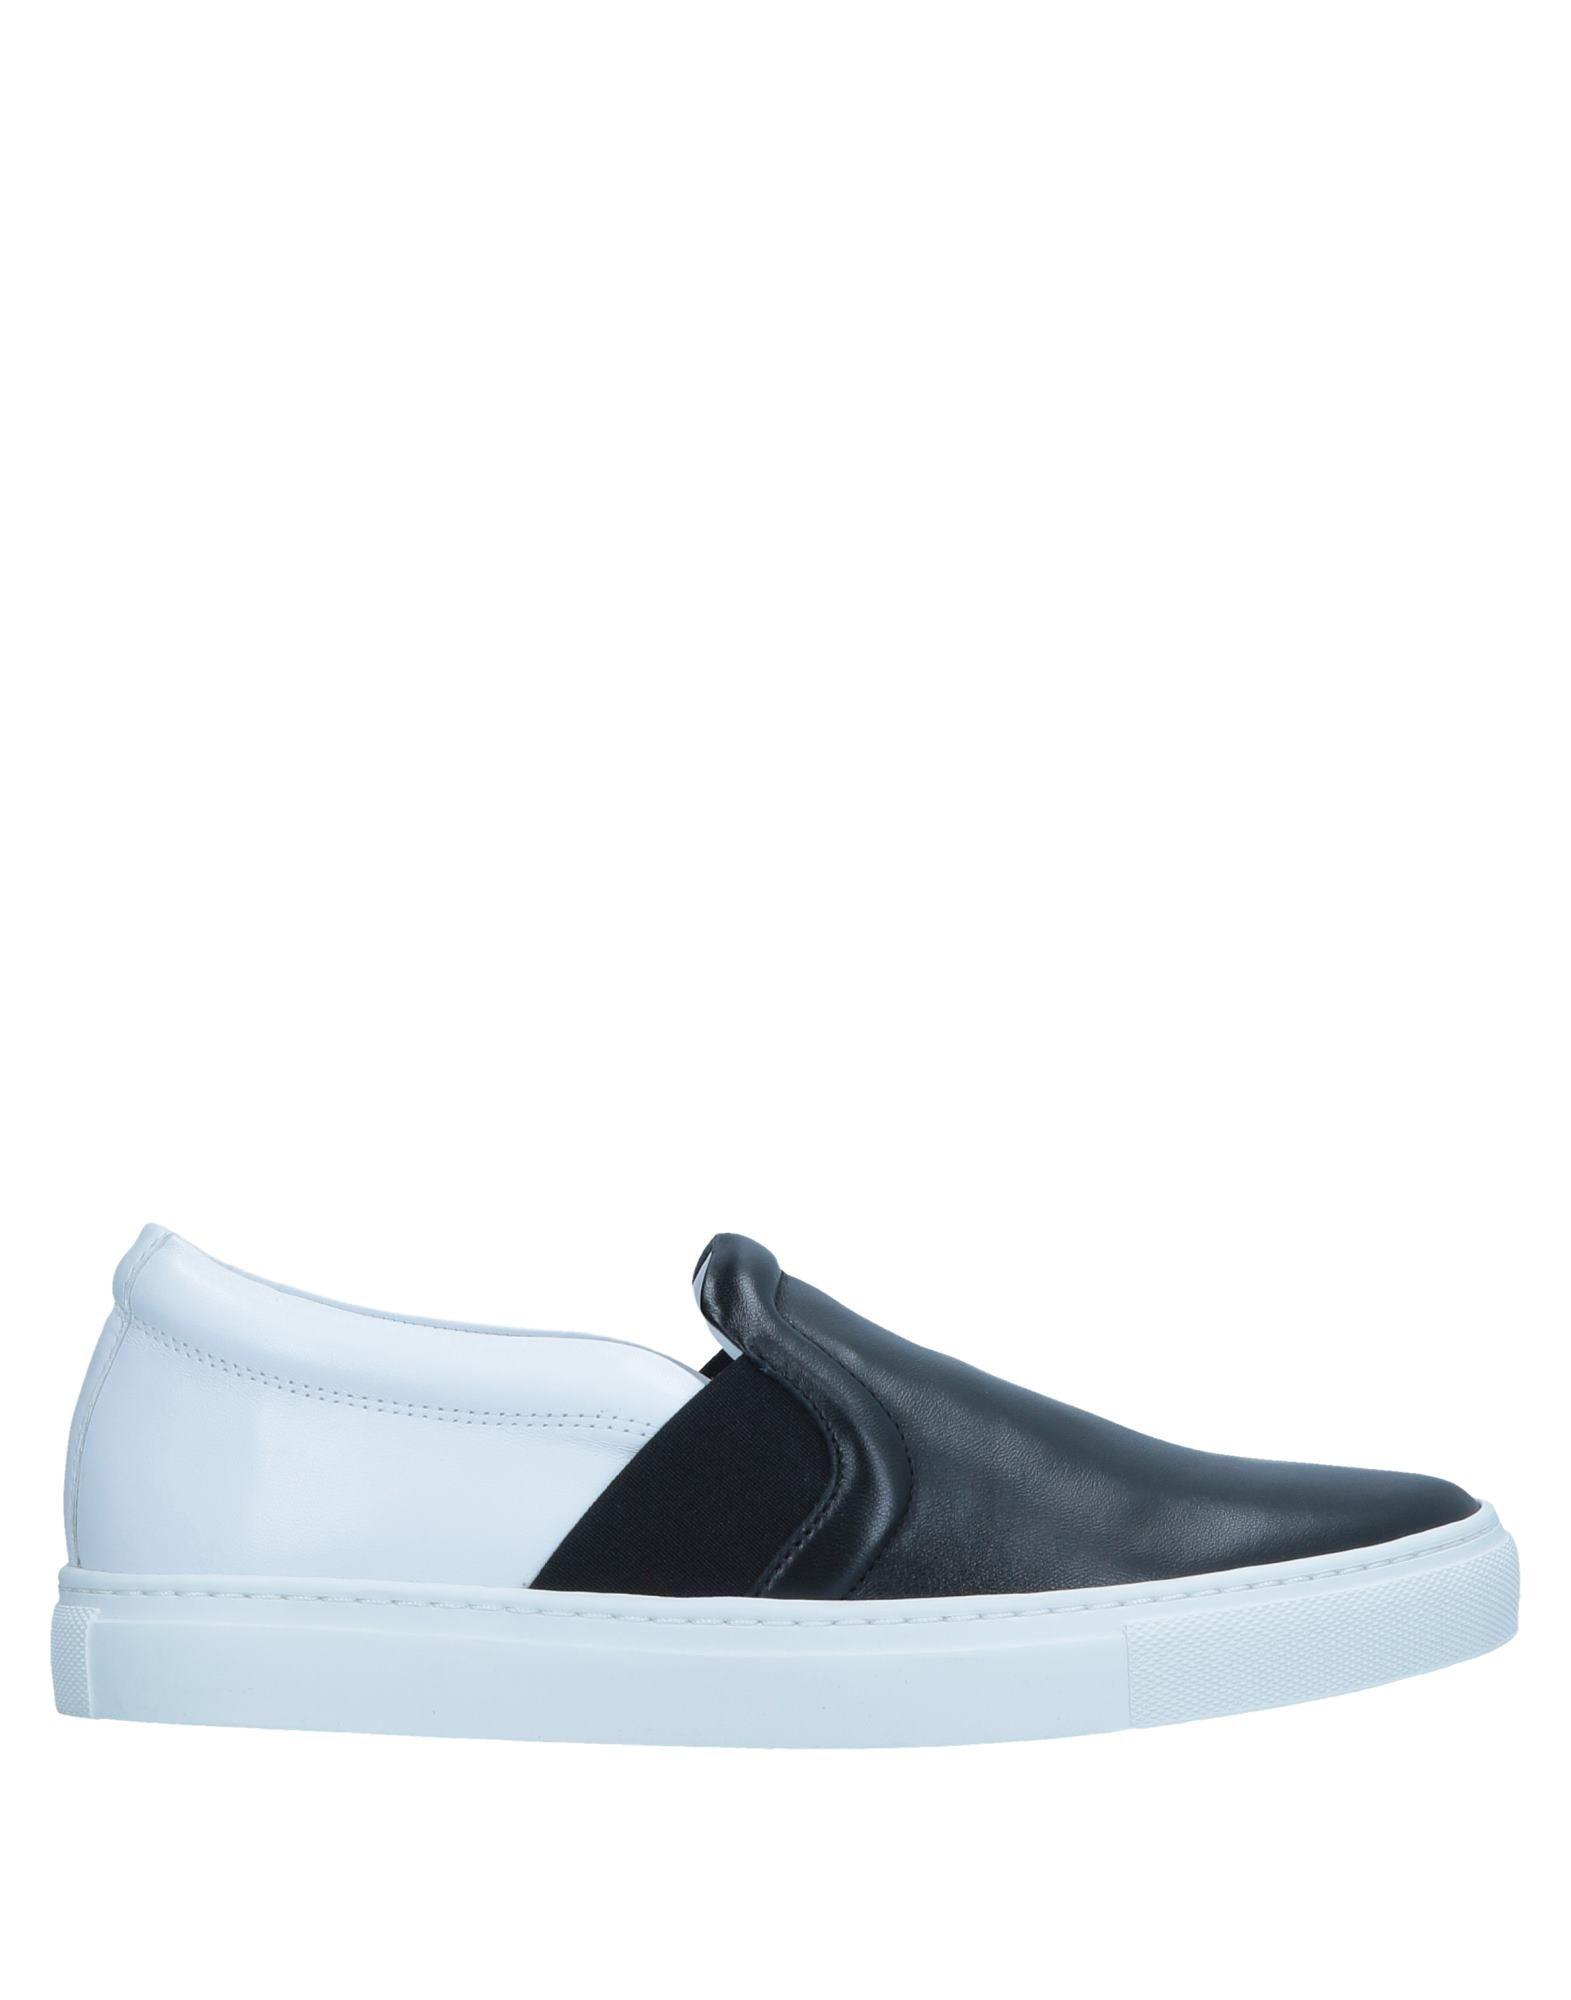 Lanvin Sneakers - Canada Women Lanvin Sneakers online on  Canada - - 11556739PI d6a6f2